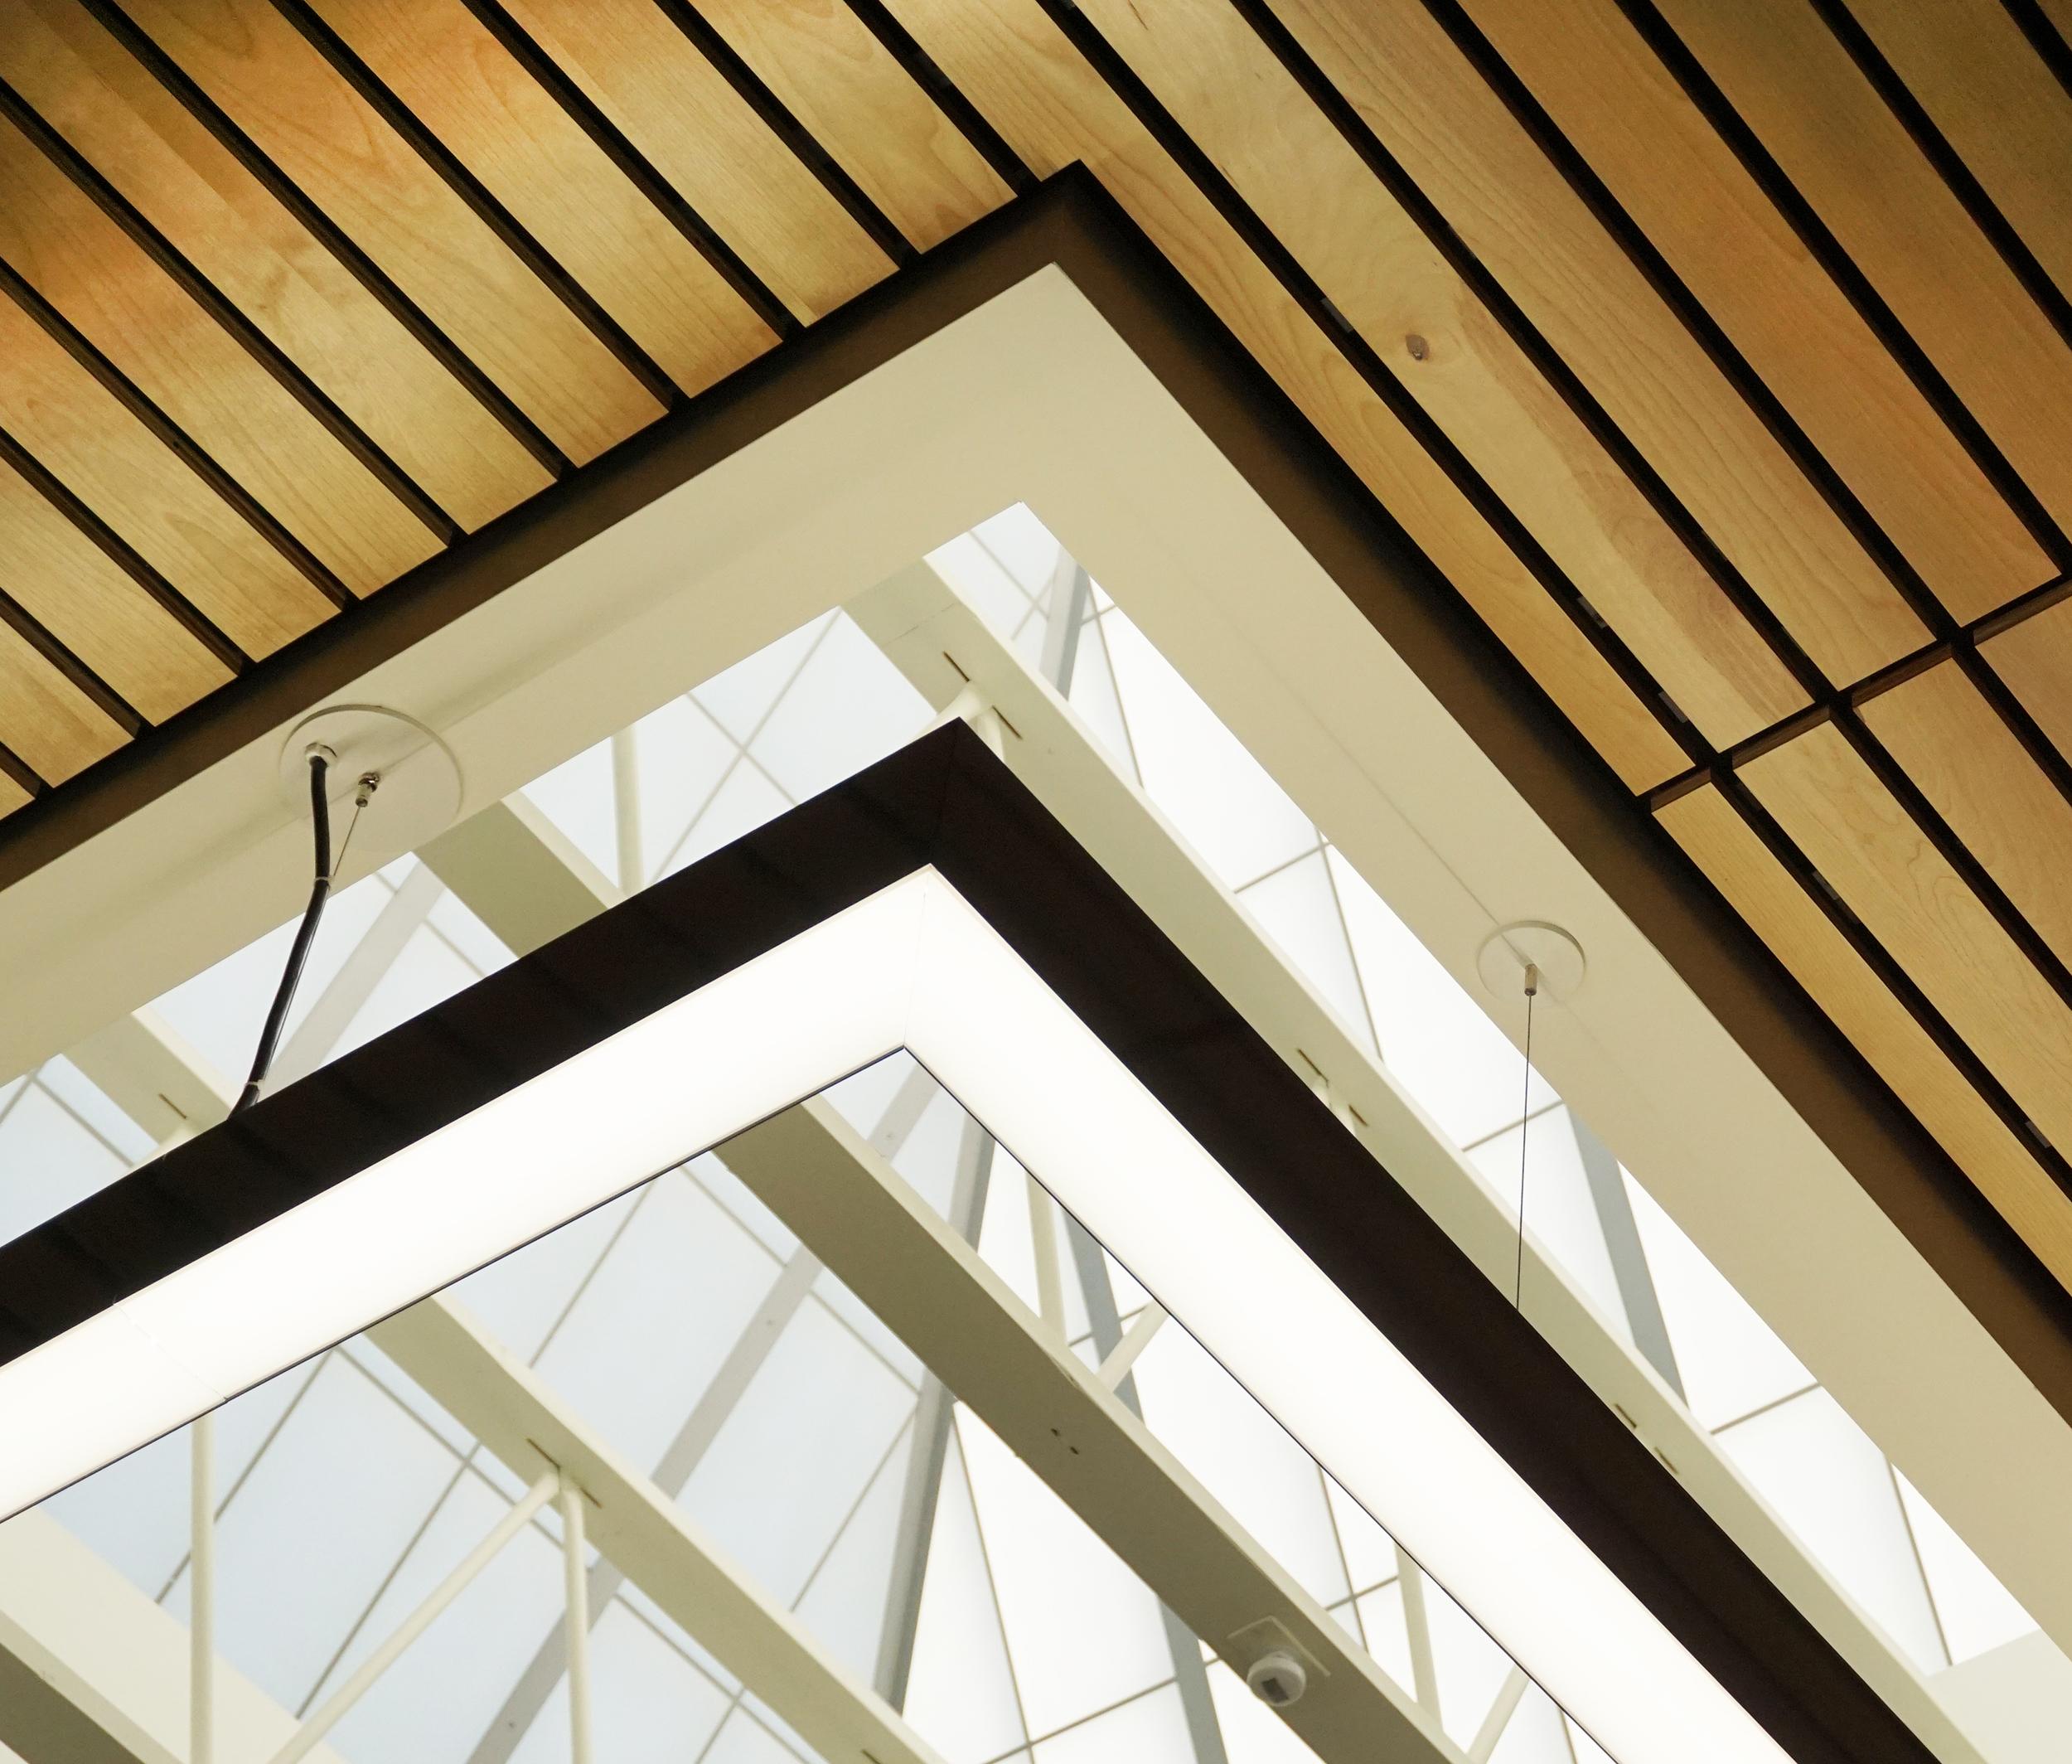 Ceiling Skylight and Slats_web.jpg